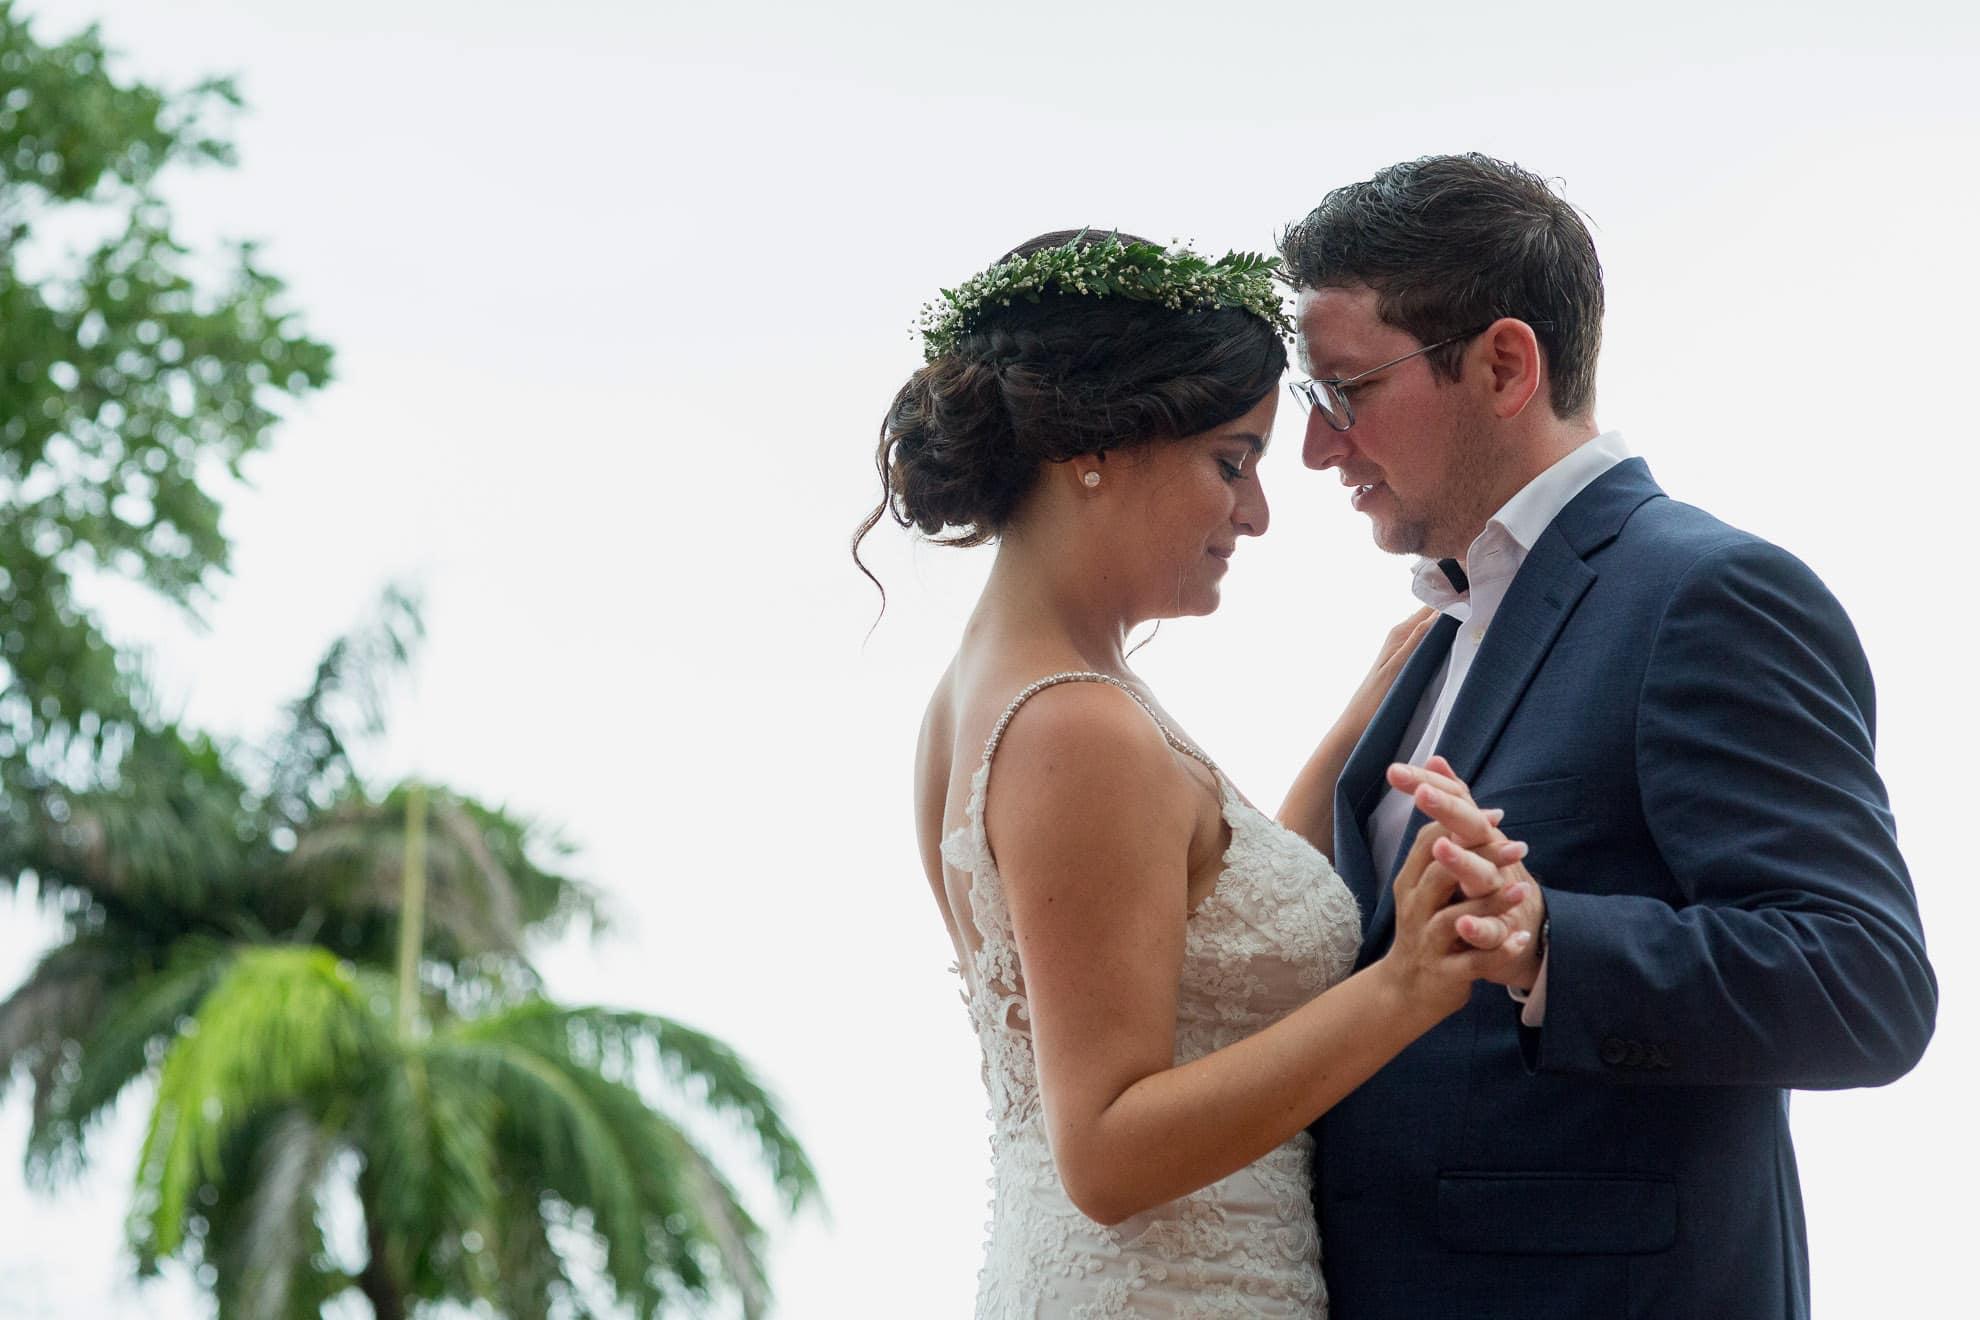 dancing together La Mariposa Destination Wedding